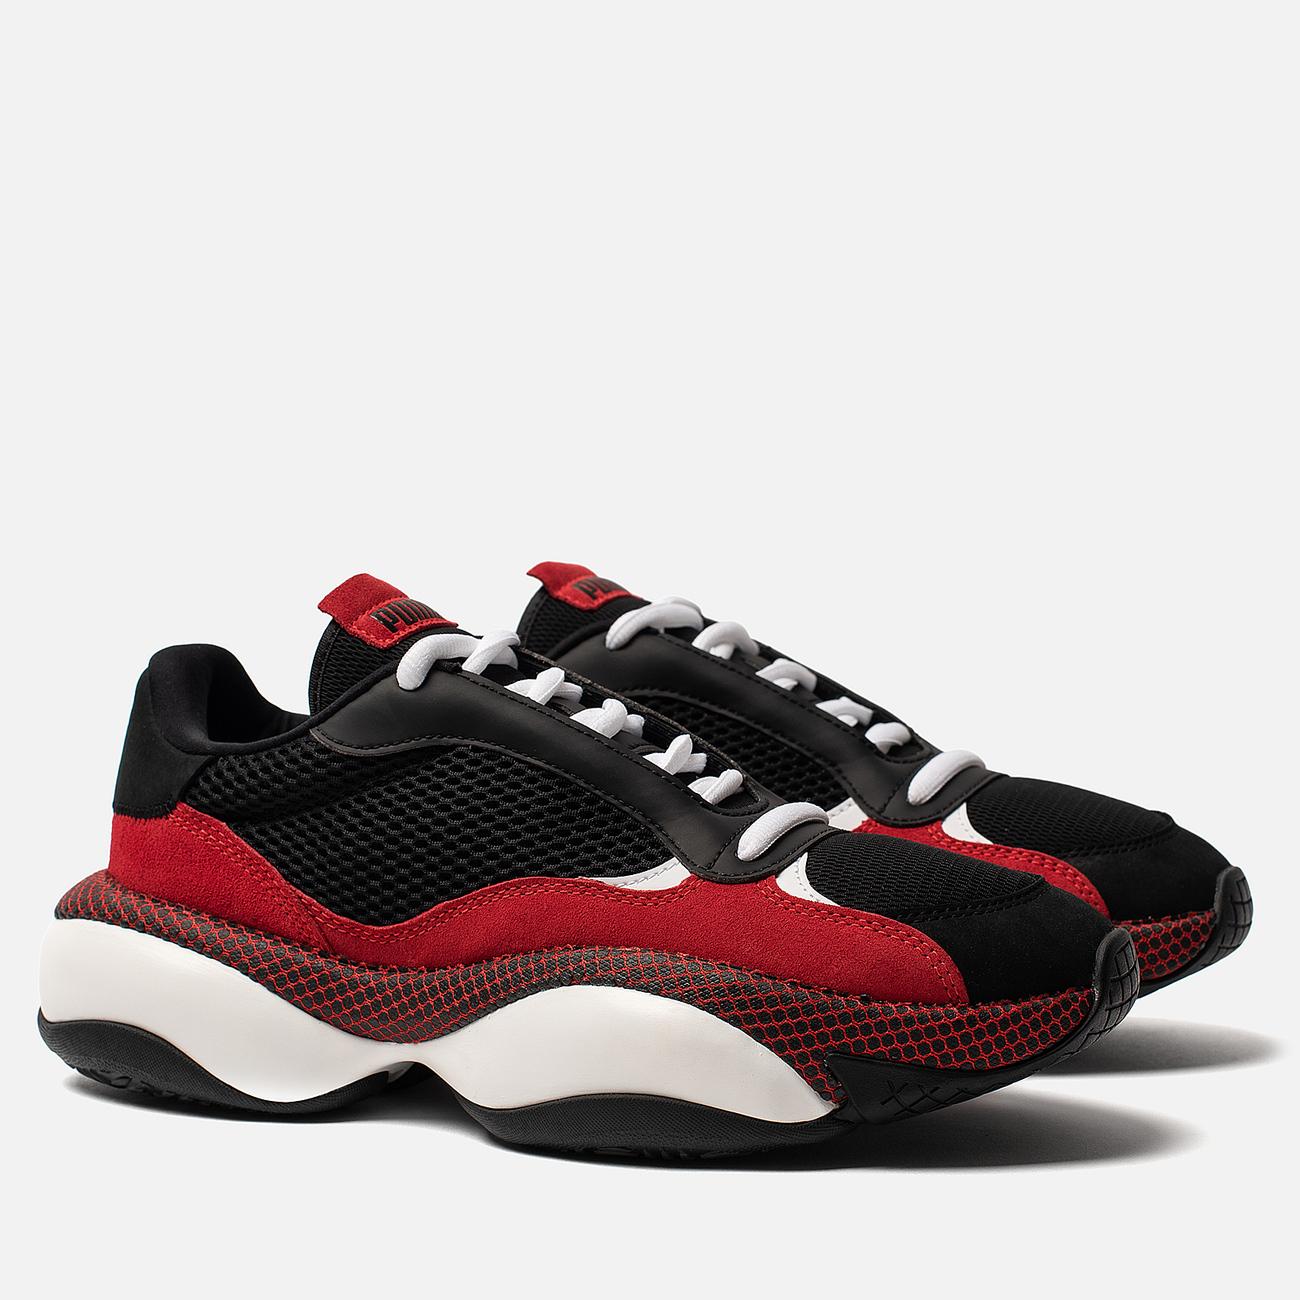 Мужские кроссовки Puma Alteration Blitz Black/High Risk Red